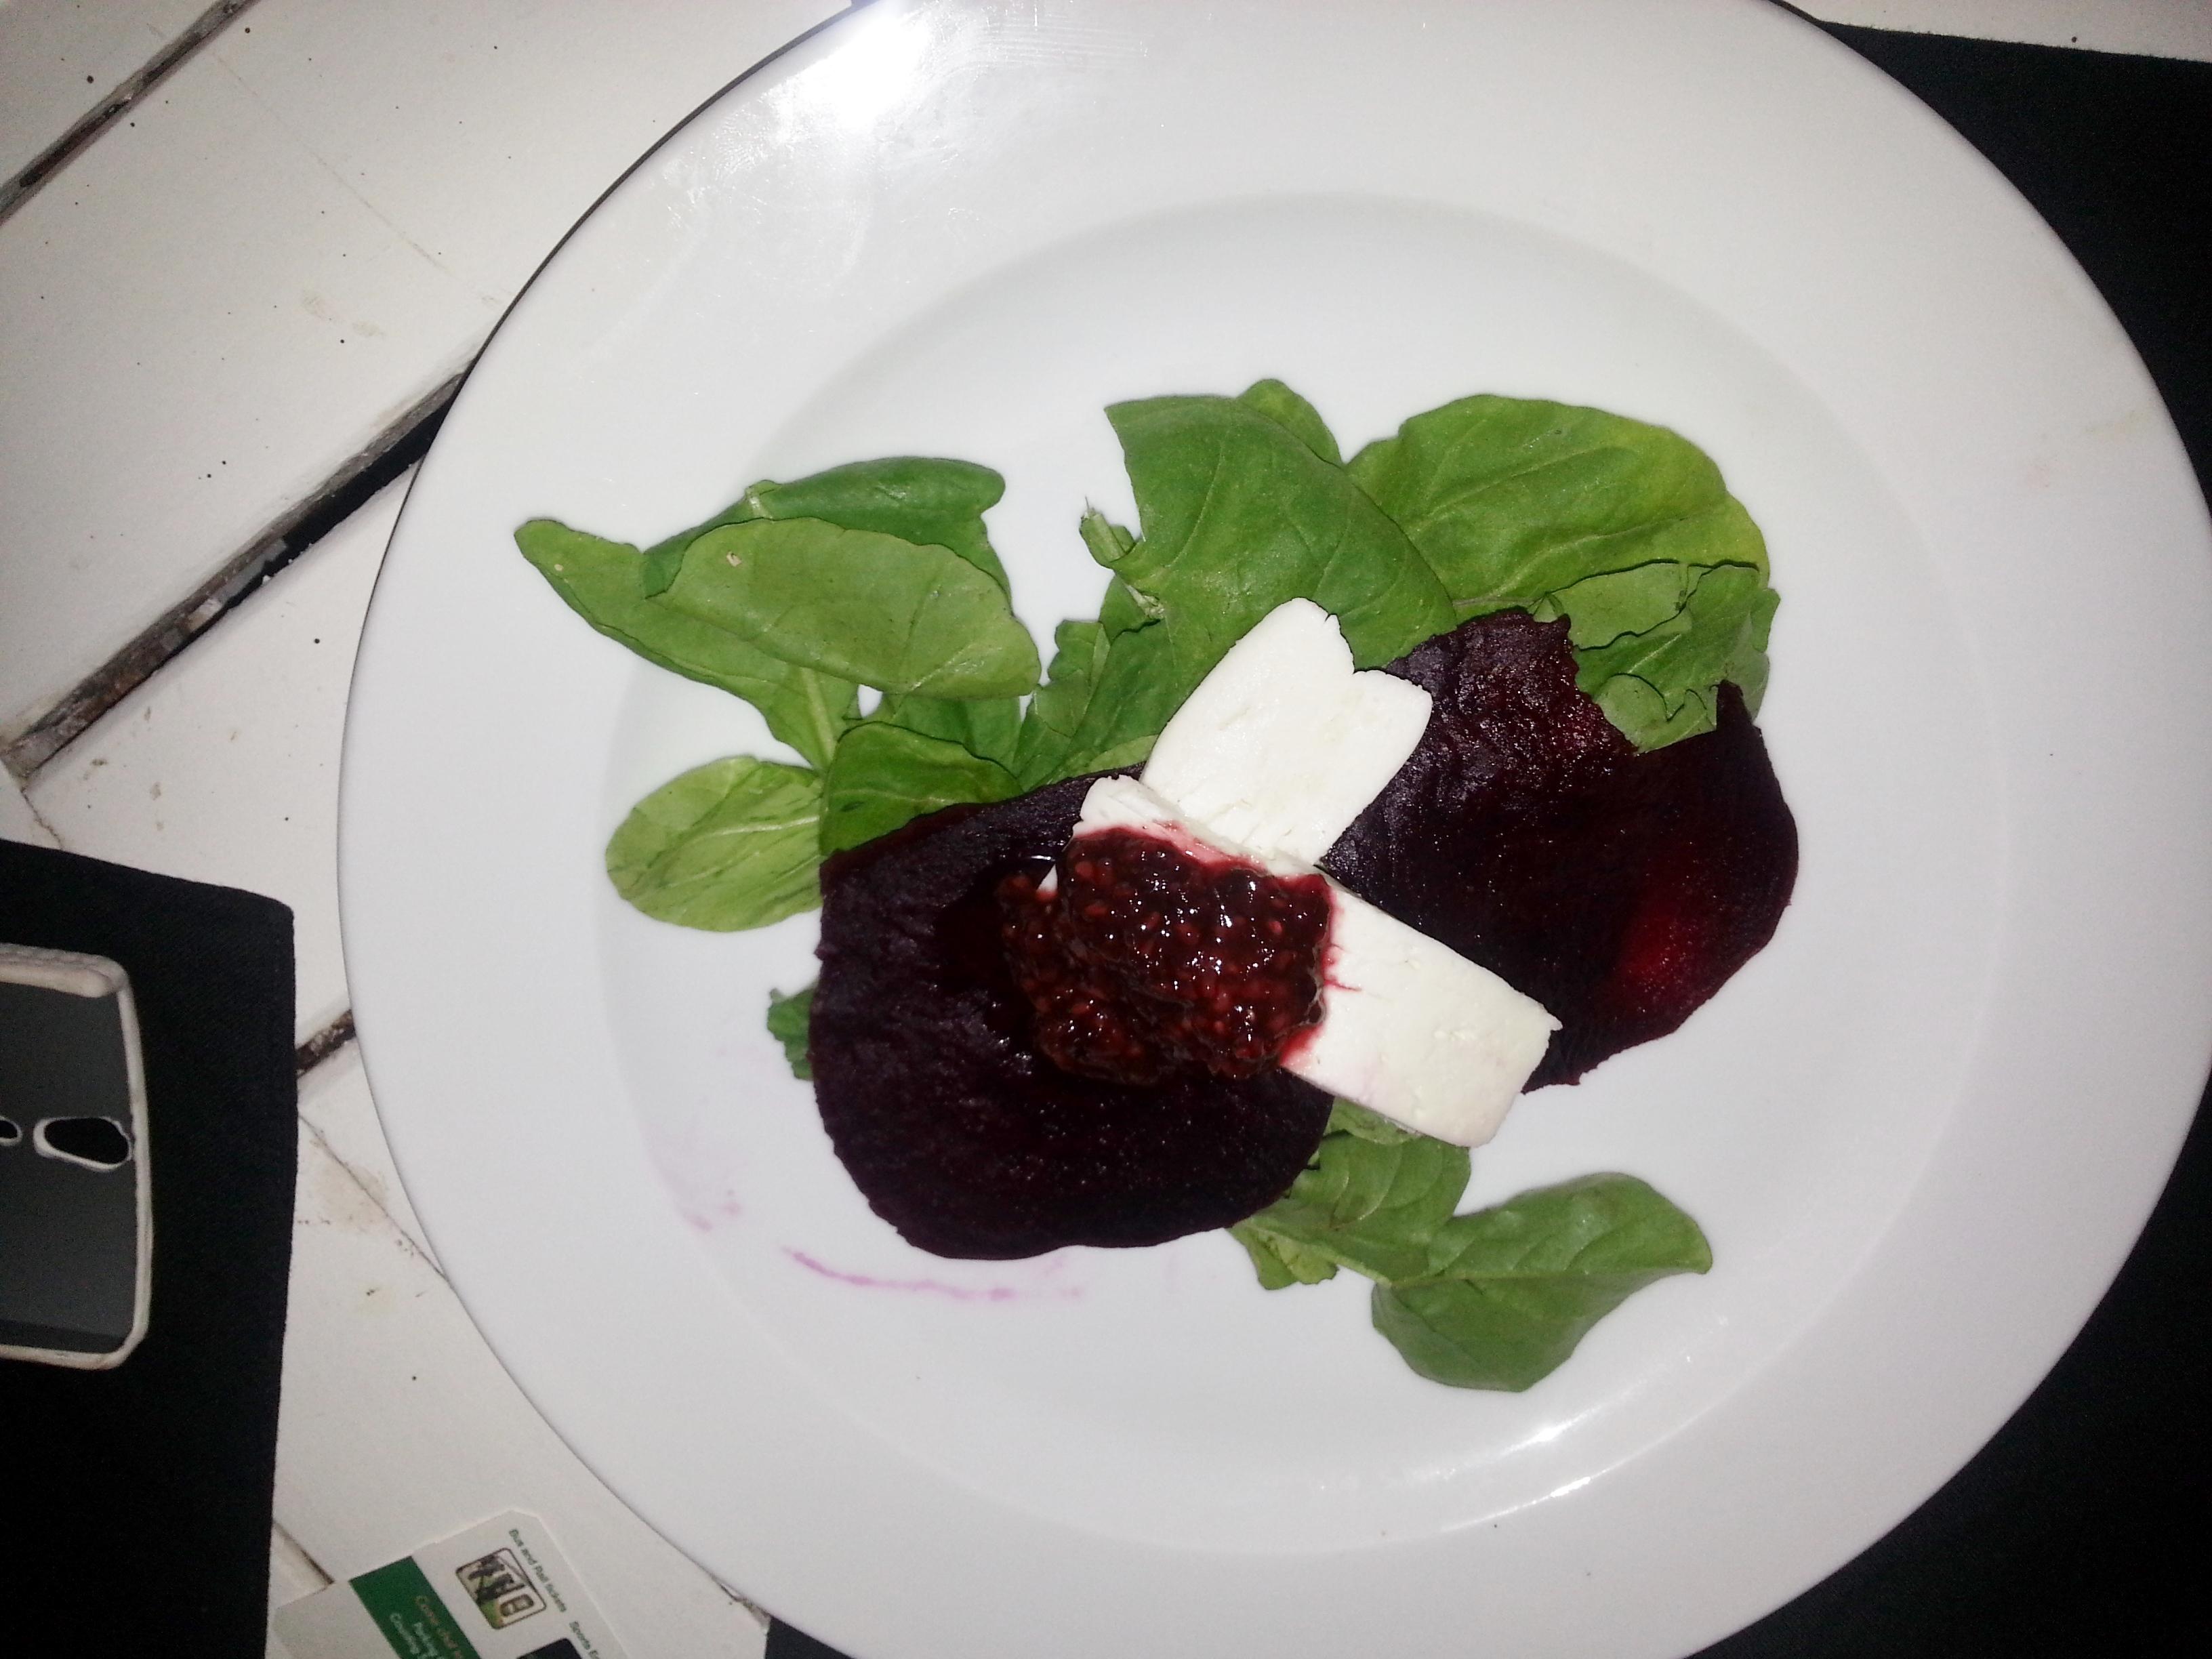 Raspberry Reduction Sauce Cakes